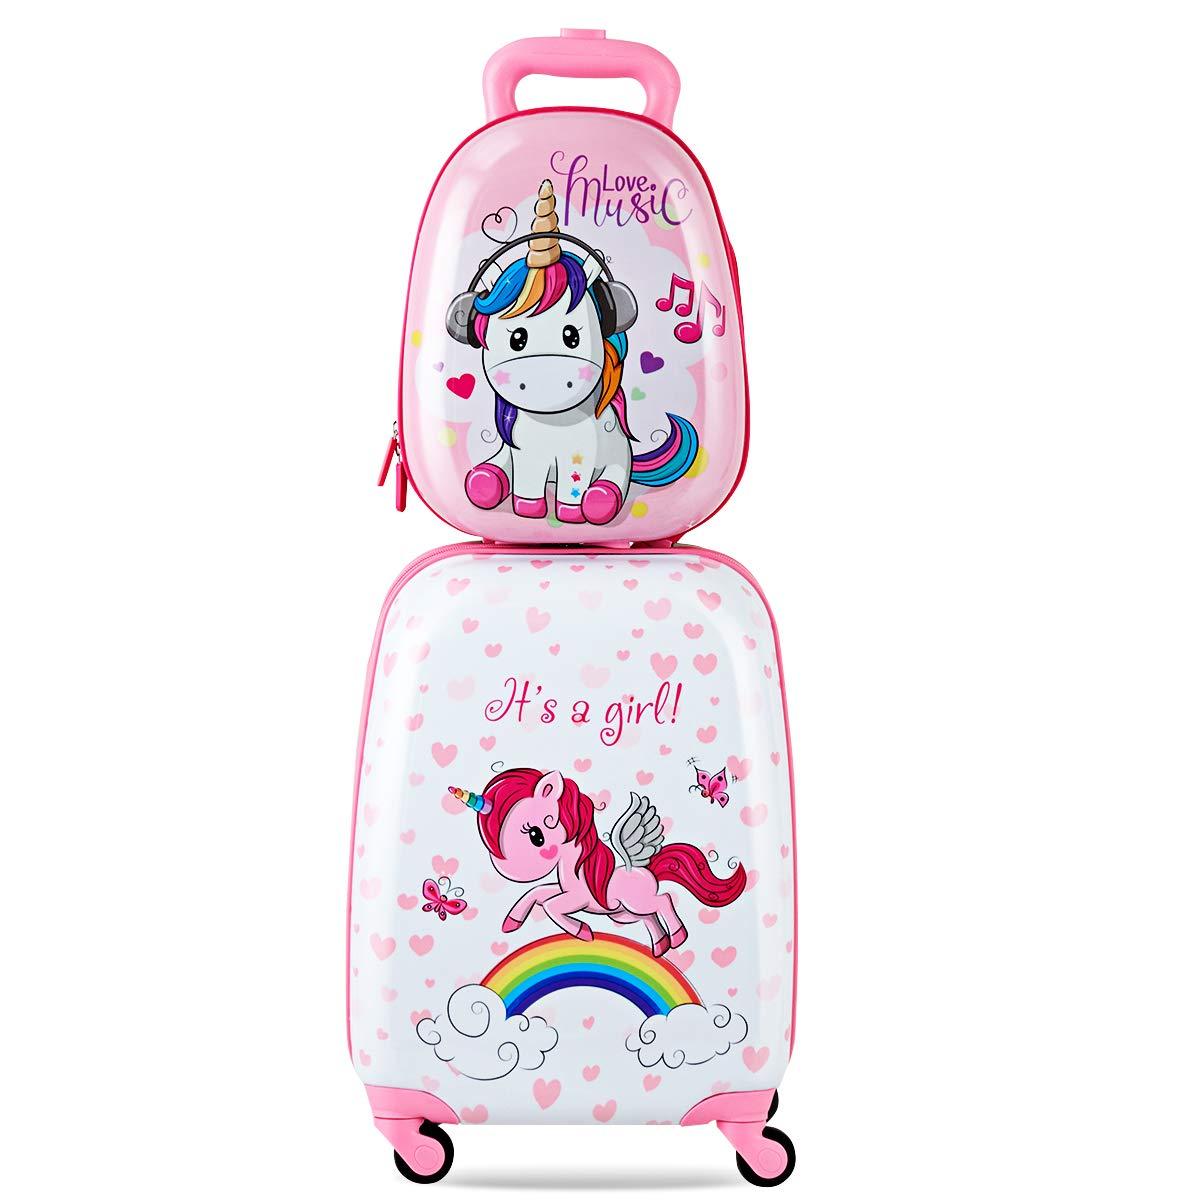 2 TLG Rucksack Einhorn rosa Kinder Kofferset Kindergep/ä ck Set Reisekofferset Kindertrolley Handgep/ä ck Kinderkoffer